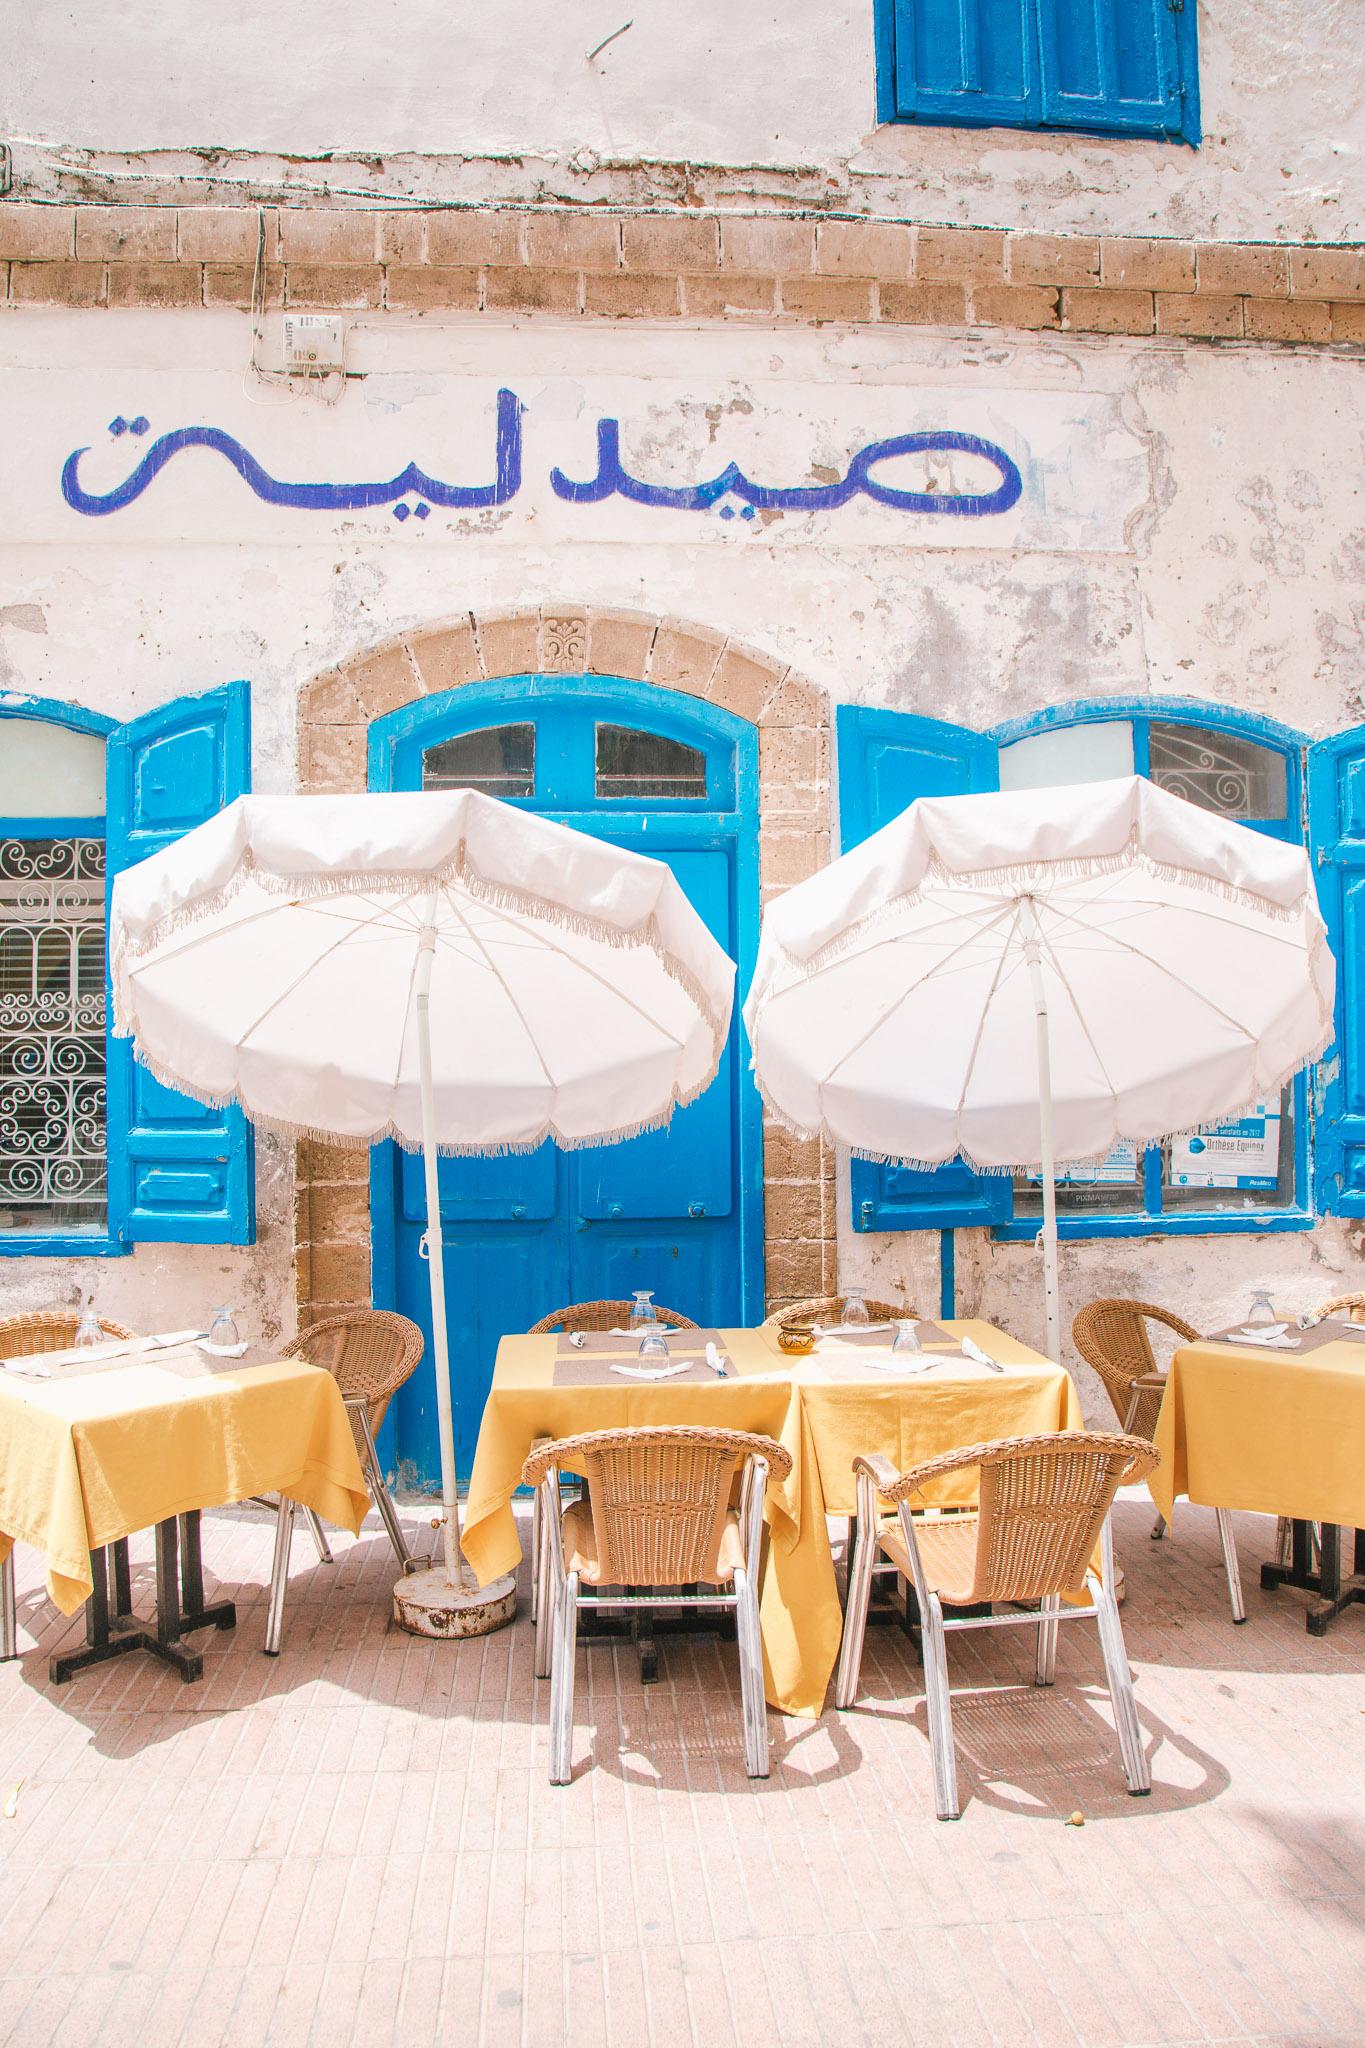 morocco-essaouira-11.jpg